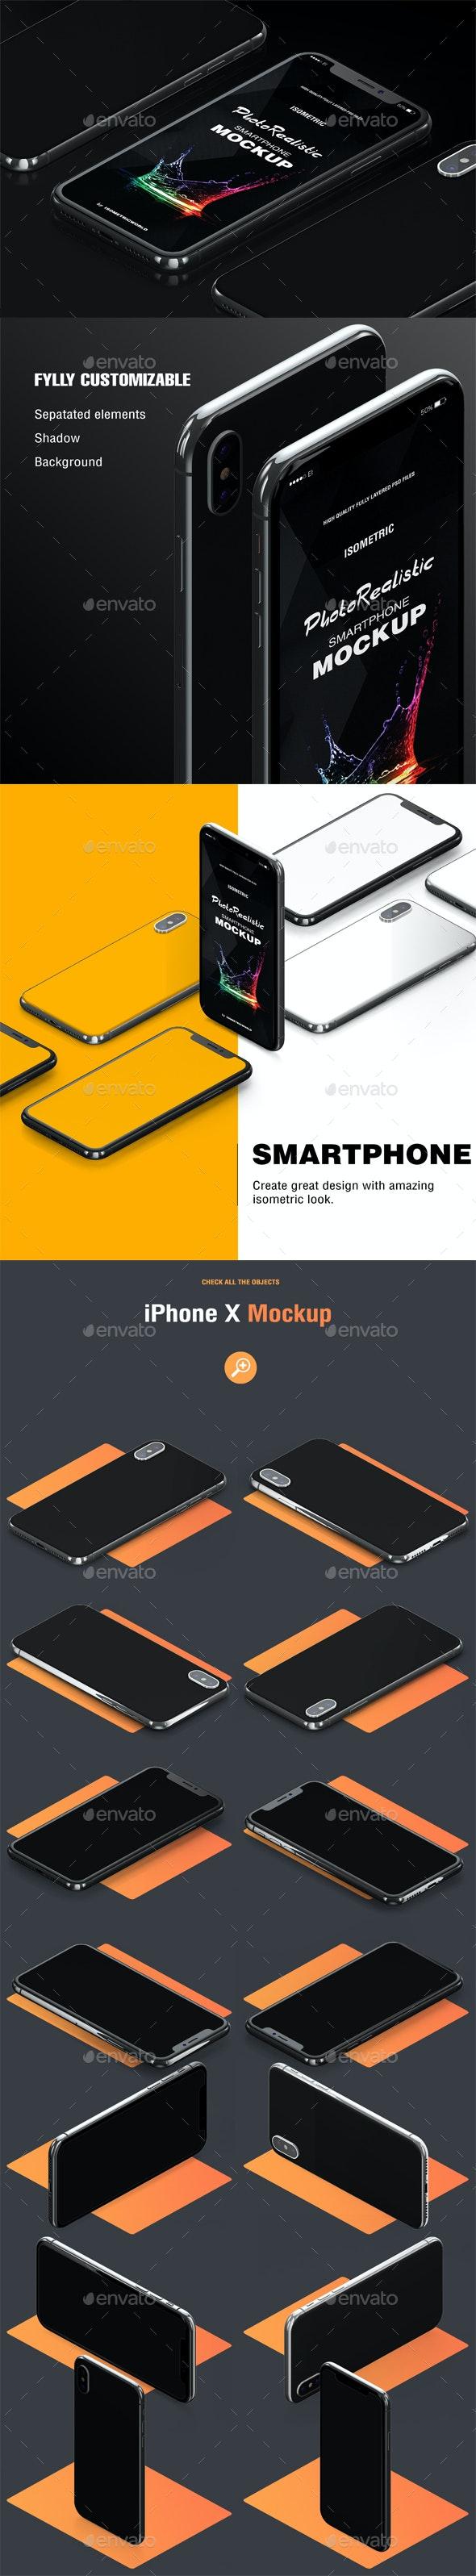 Isometric Phone X Mock-up - Product Mock-Ups Graphics